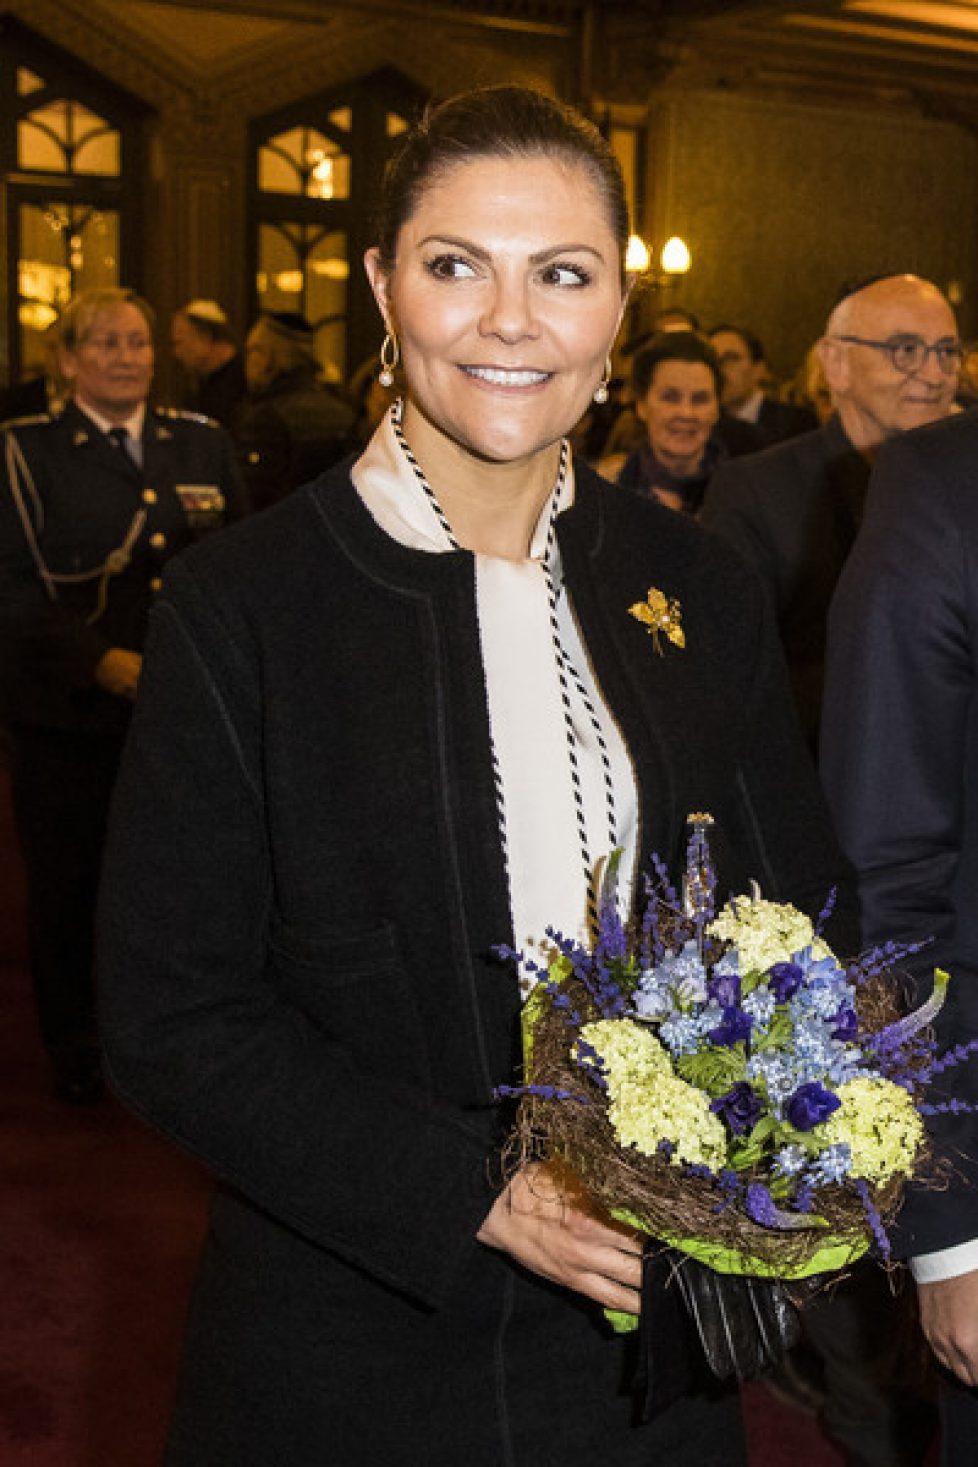 Crown+princess+Victoria+Sweden+Attends+Memorial+5DxZamqE5Zvl